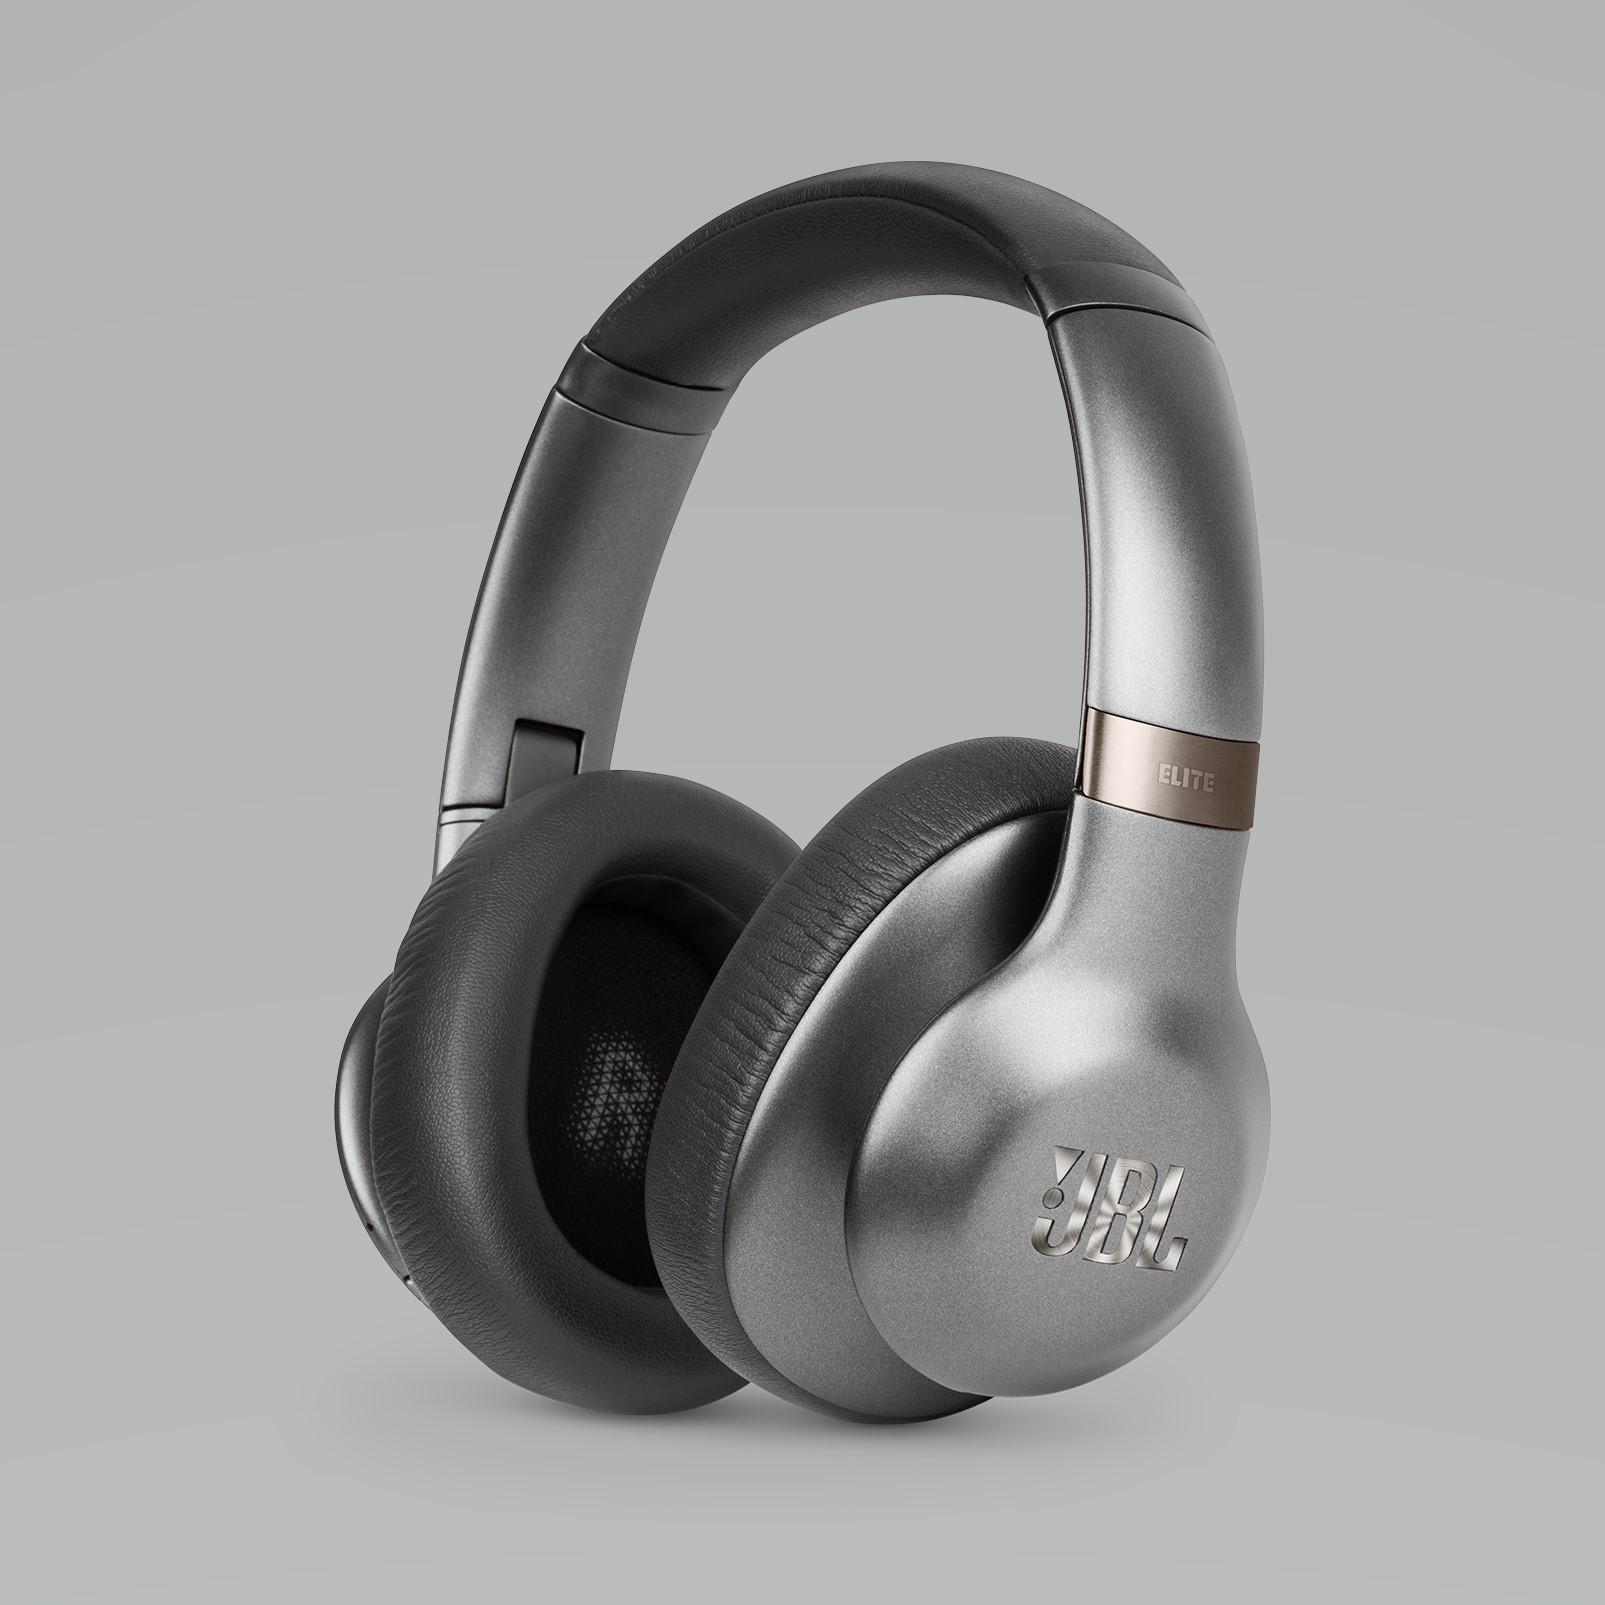 JBL Everest Elite 750NC Over Ear Bluetooth Headphones (Refurbished) $70 + Free Shipping